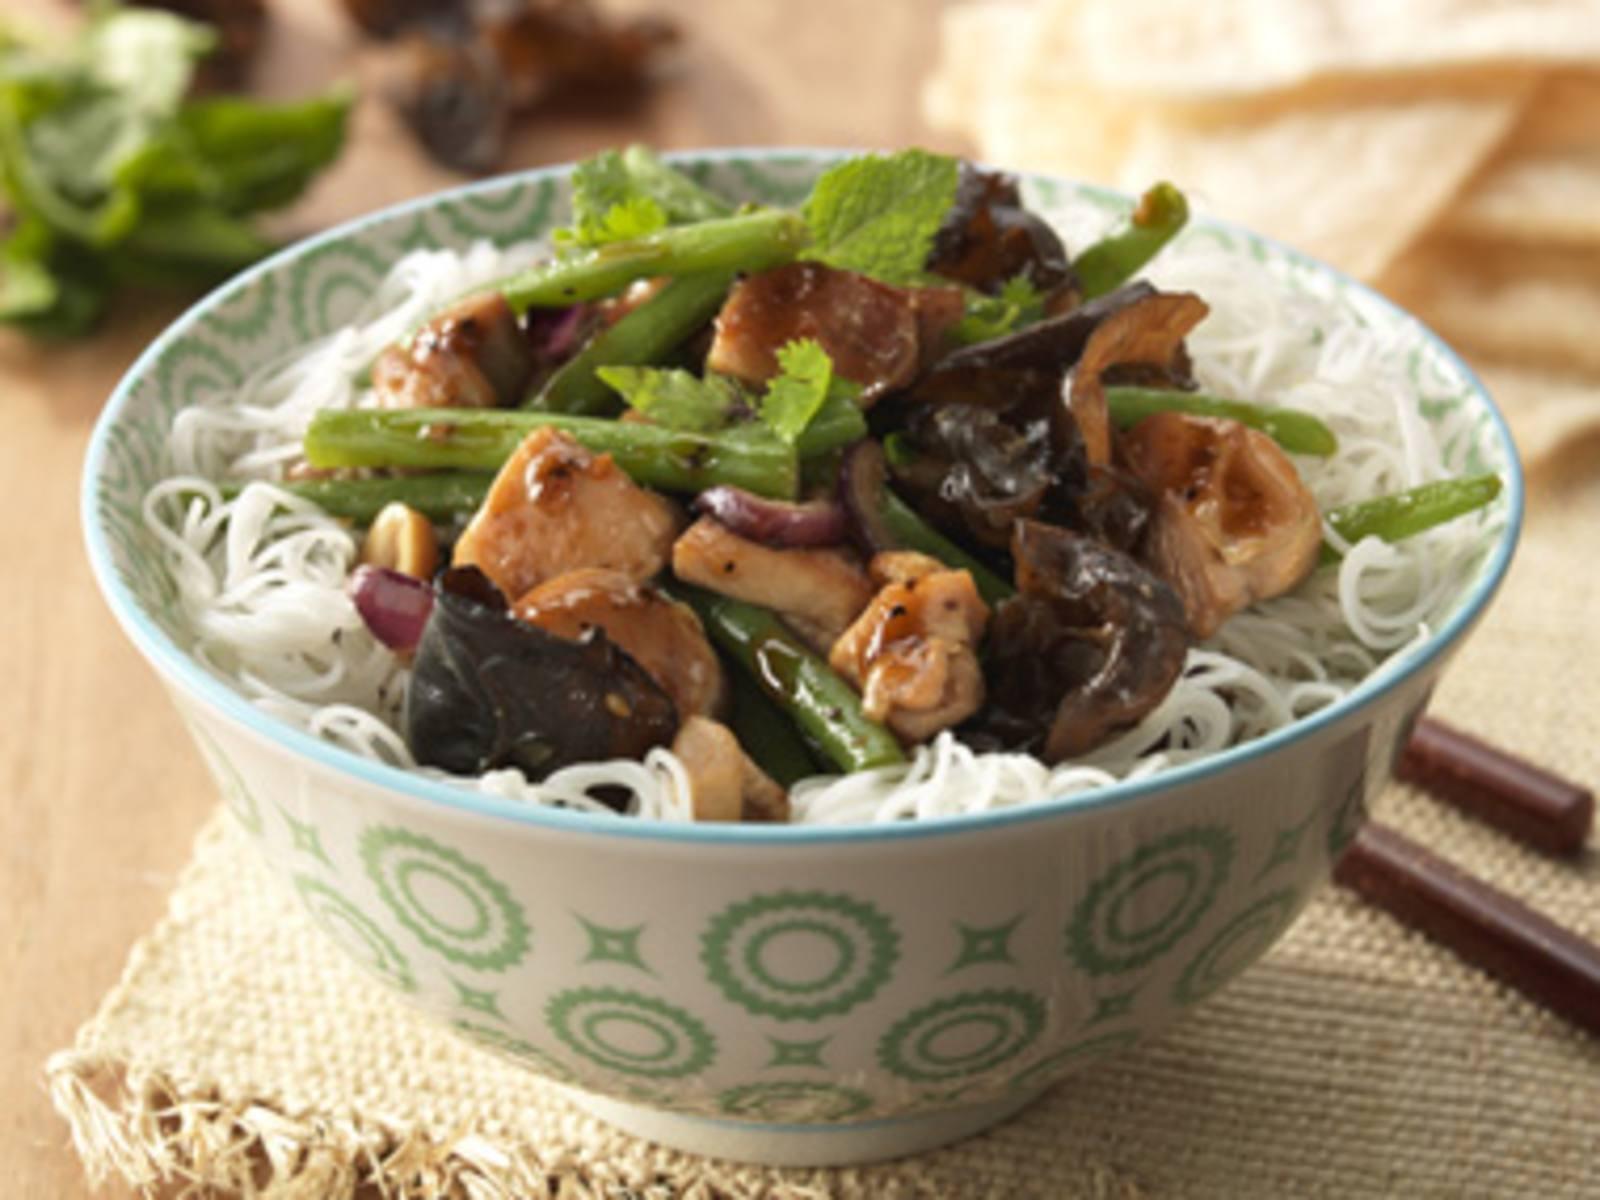 Kip met haricots verts en Soja, Ginger & Black Pepper